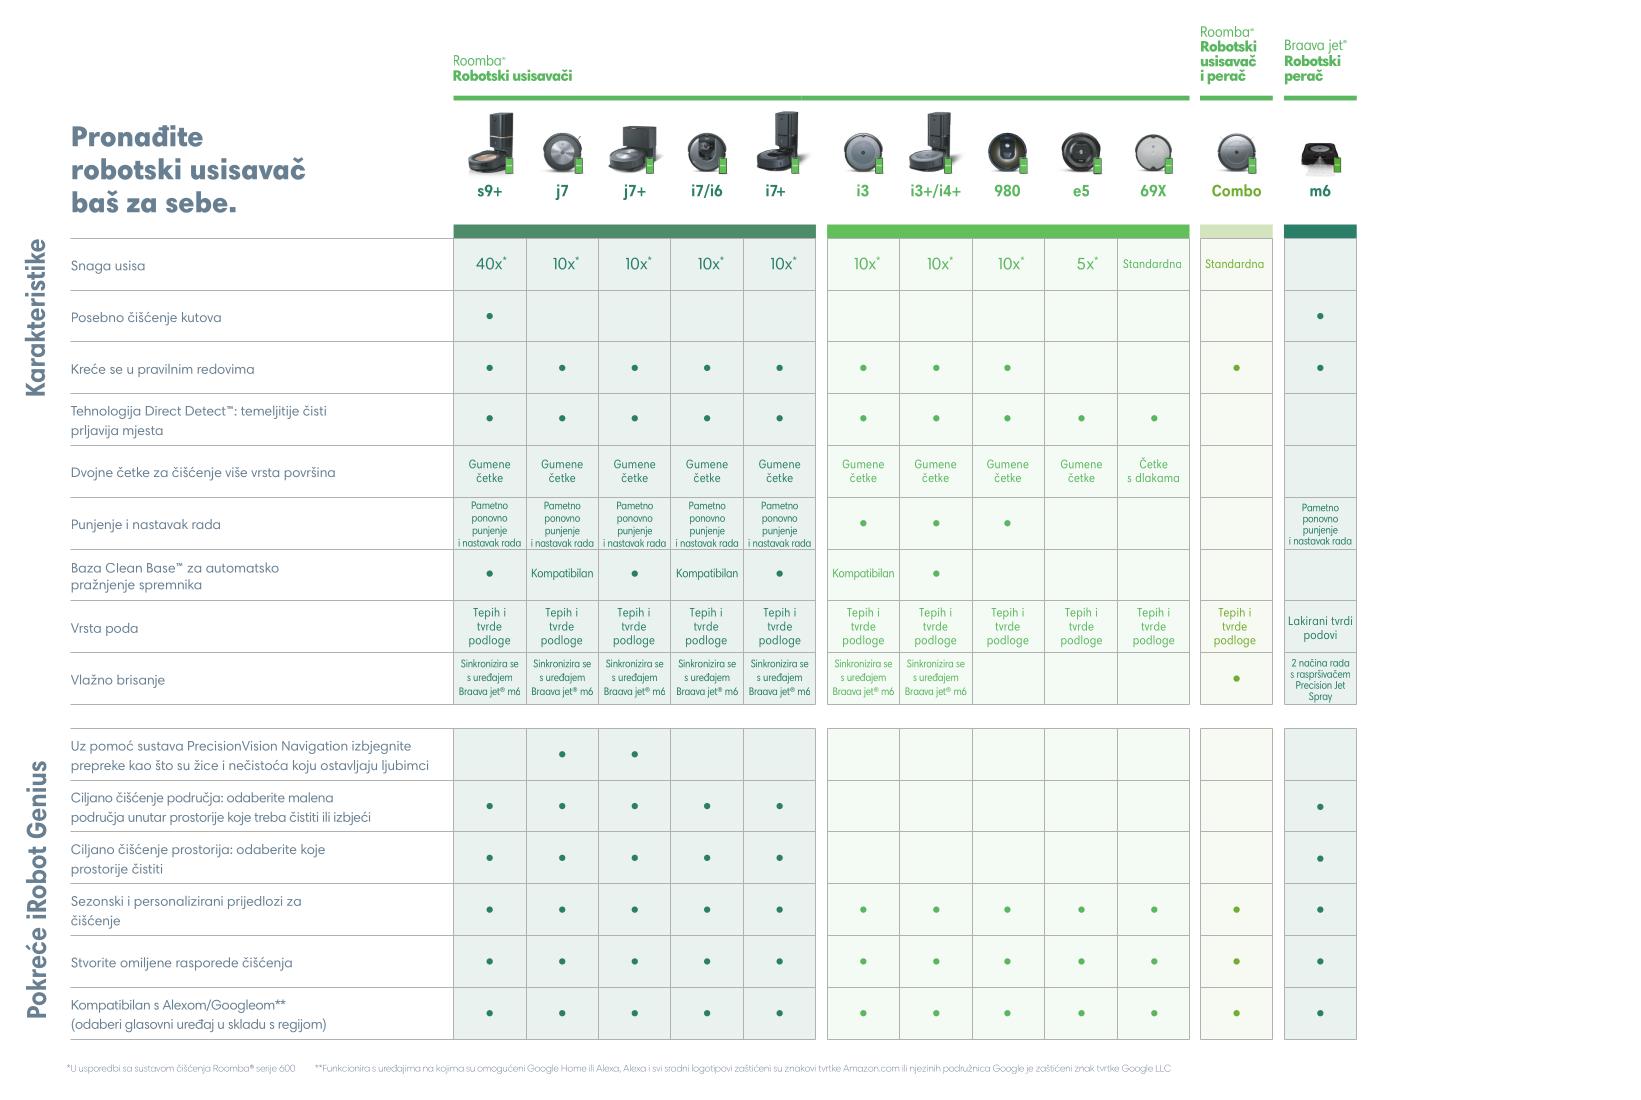 iRobot Comparision chart